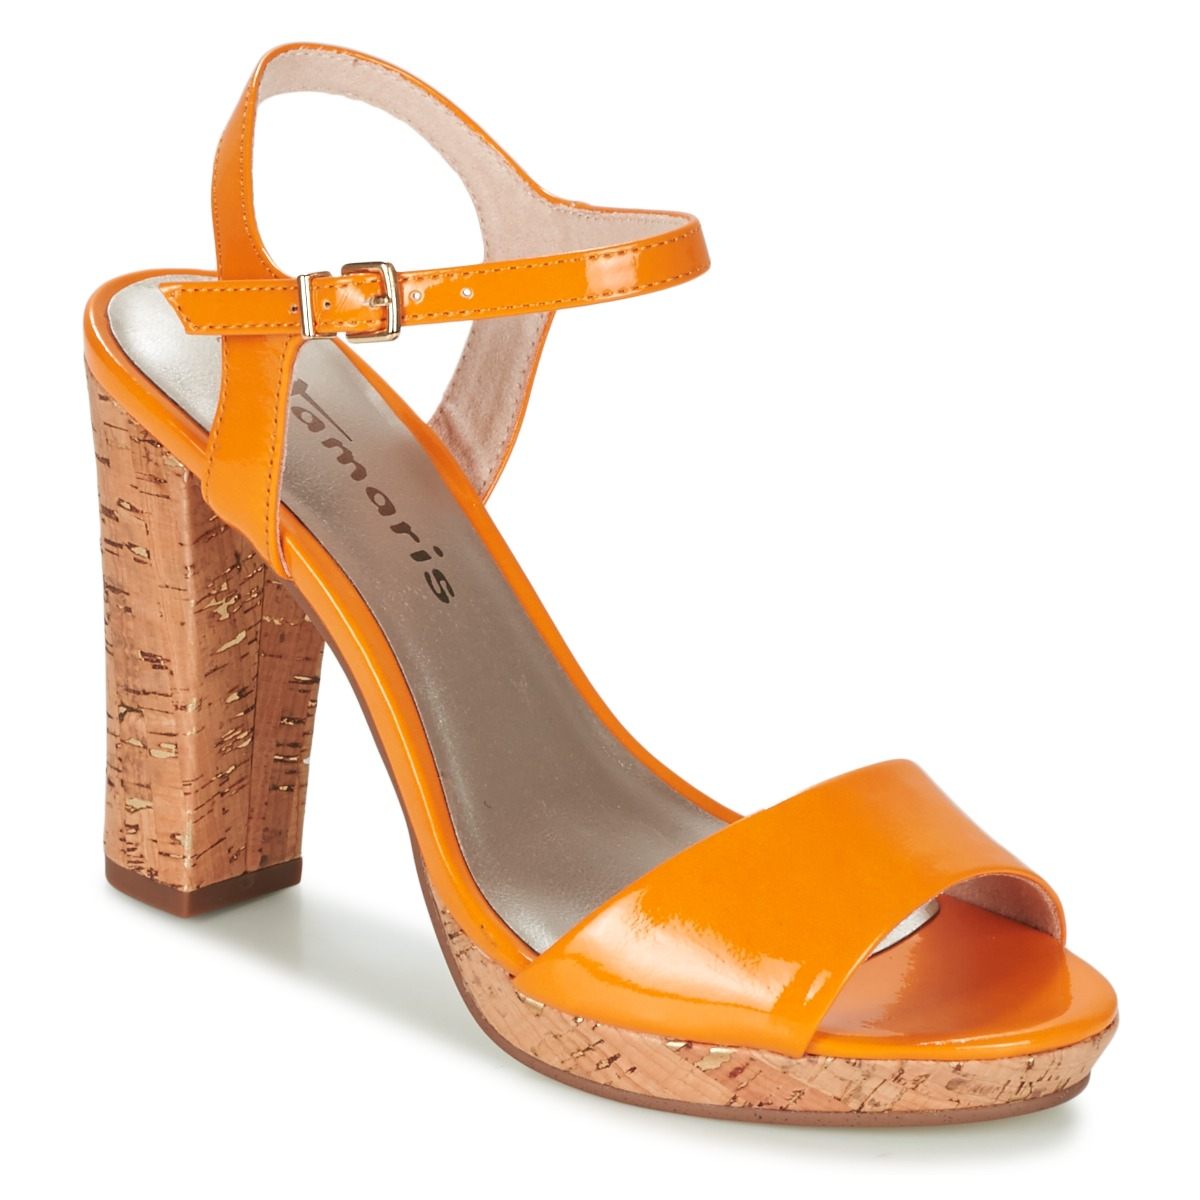 acquista autentico qualità incredibile vendita professionale Tamaris Sandali & Odprti čevlji BEBE Oranžna - Ceneje.si